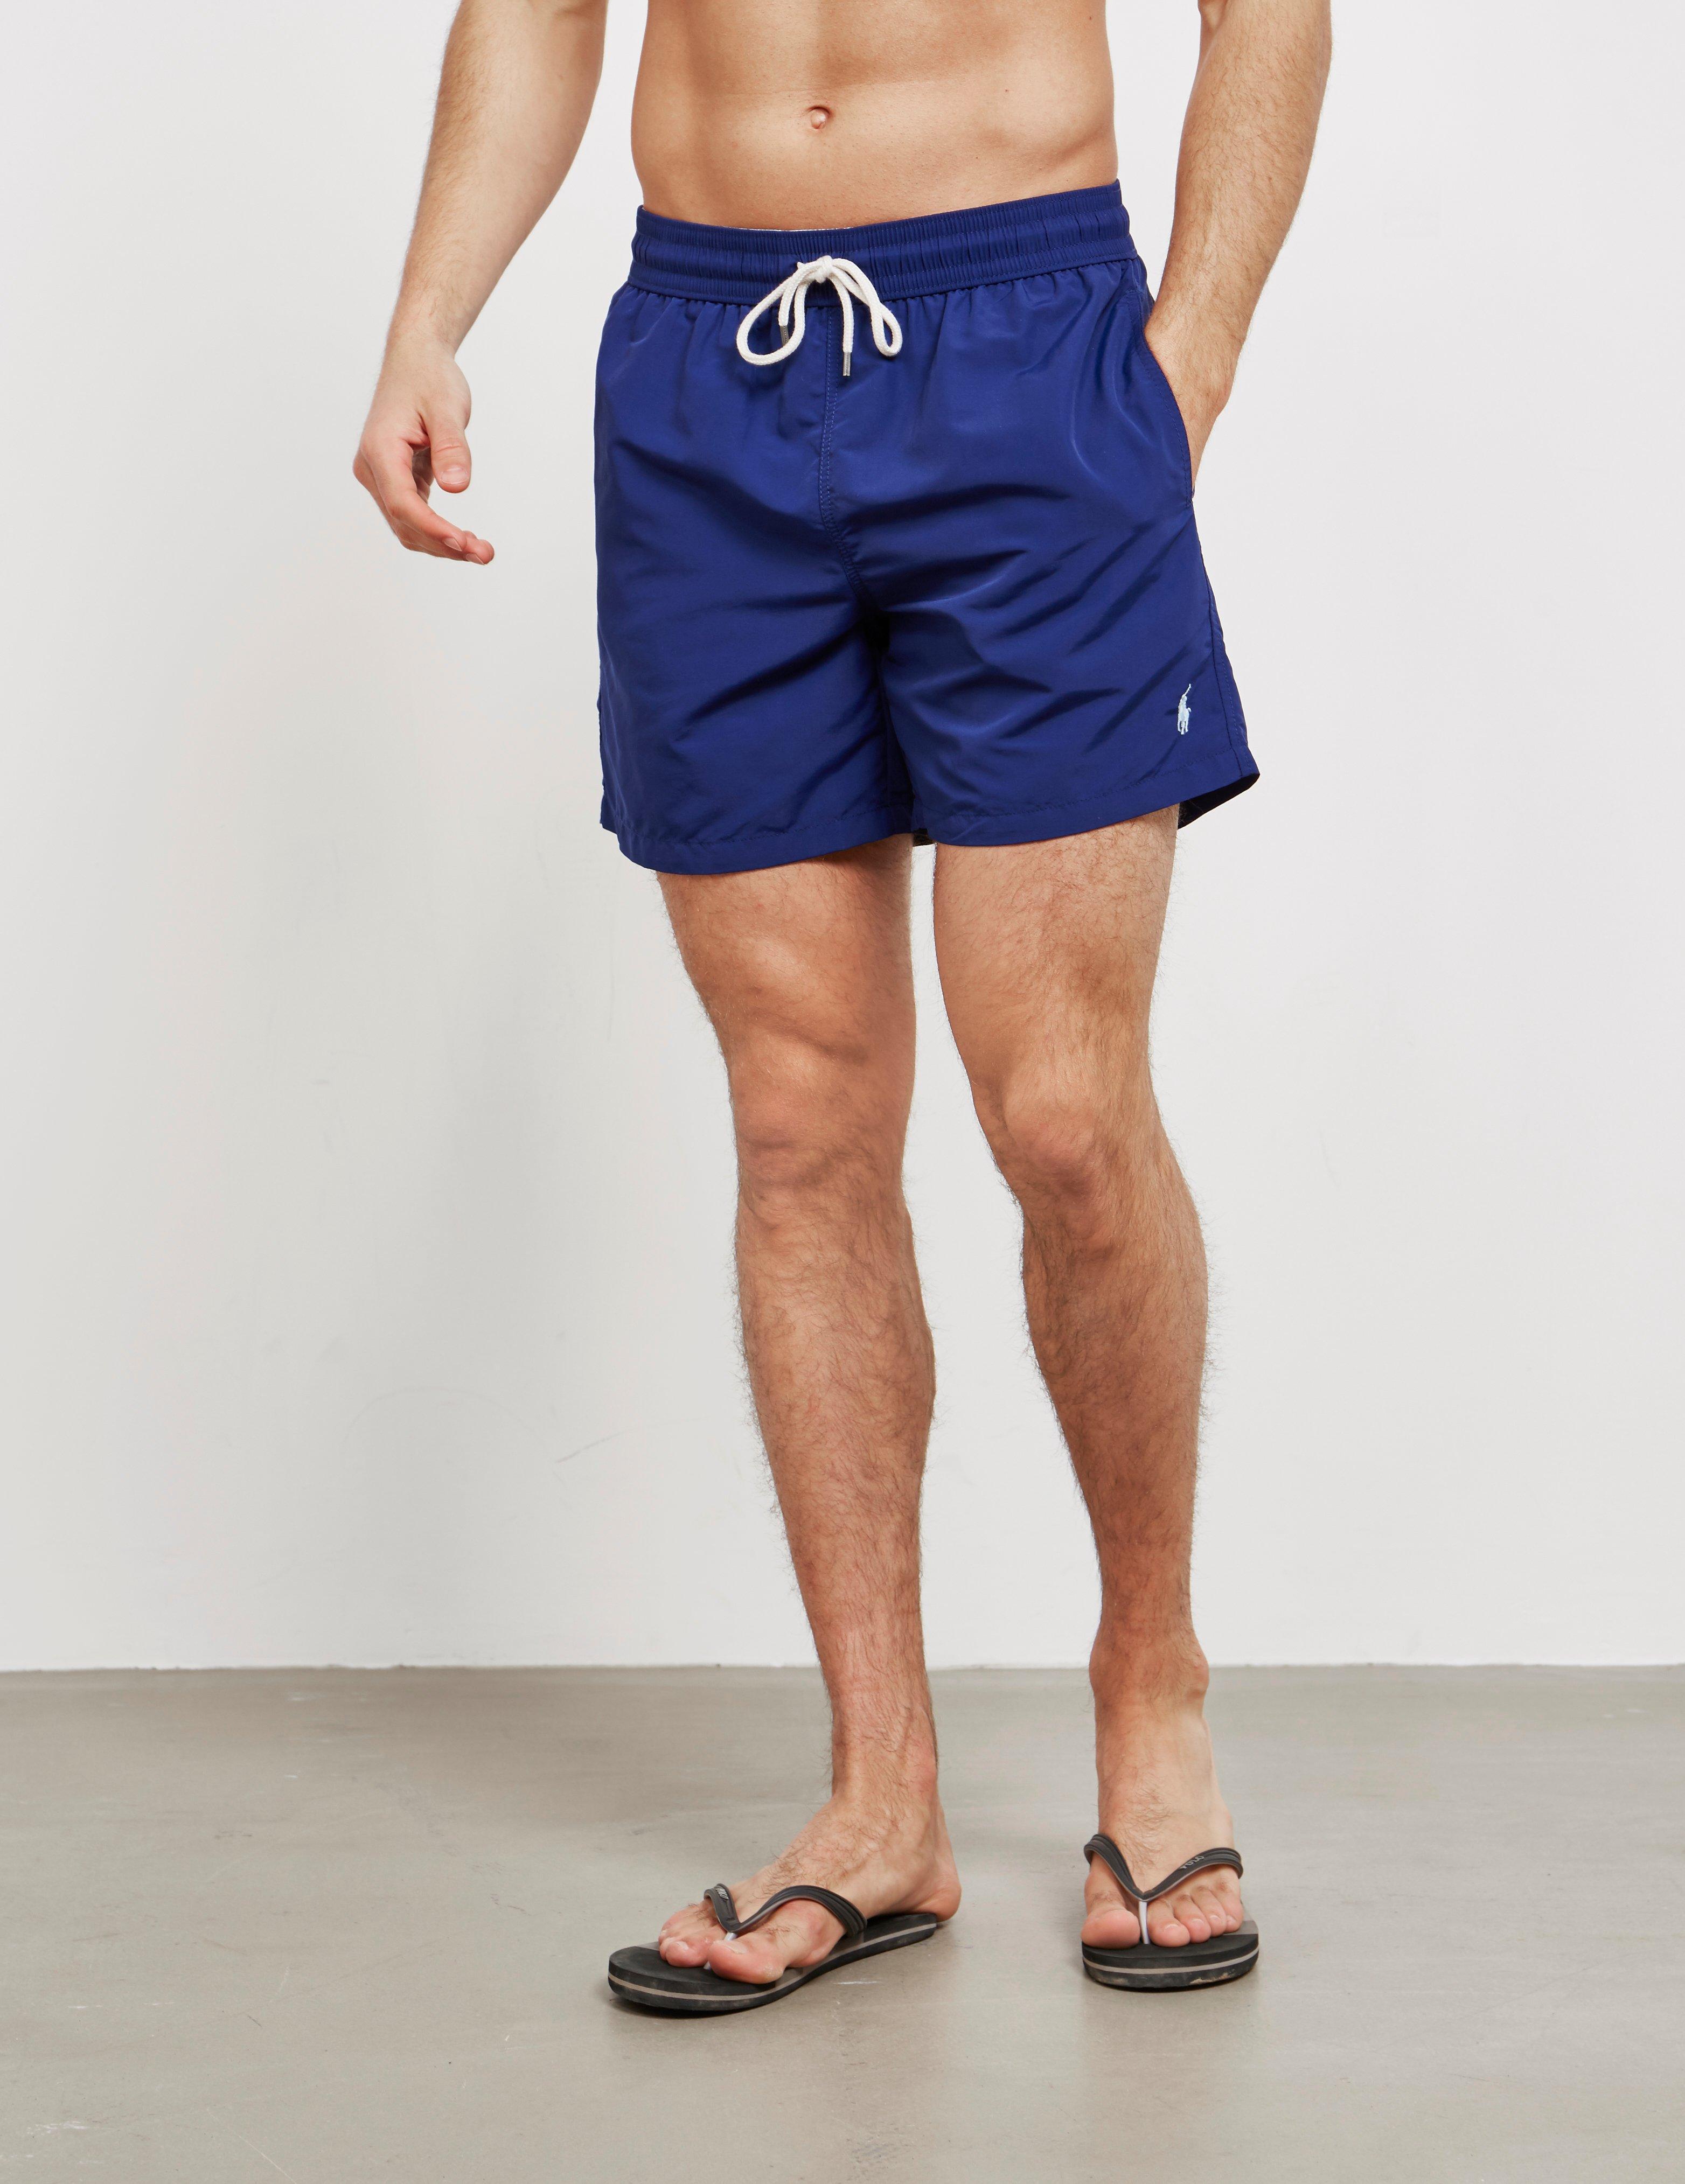 23999a47b4202 Polo Ralph Lauren Basic Swim Shorts Navy Blue in Blue for Men - Lyst